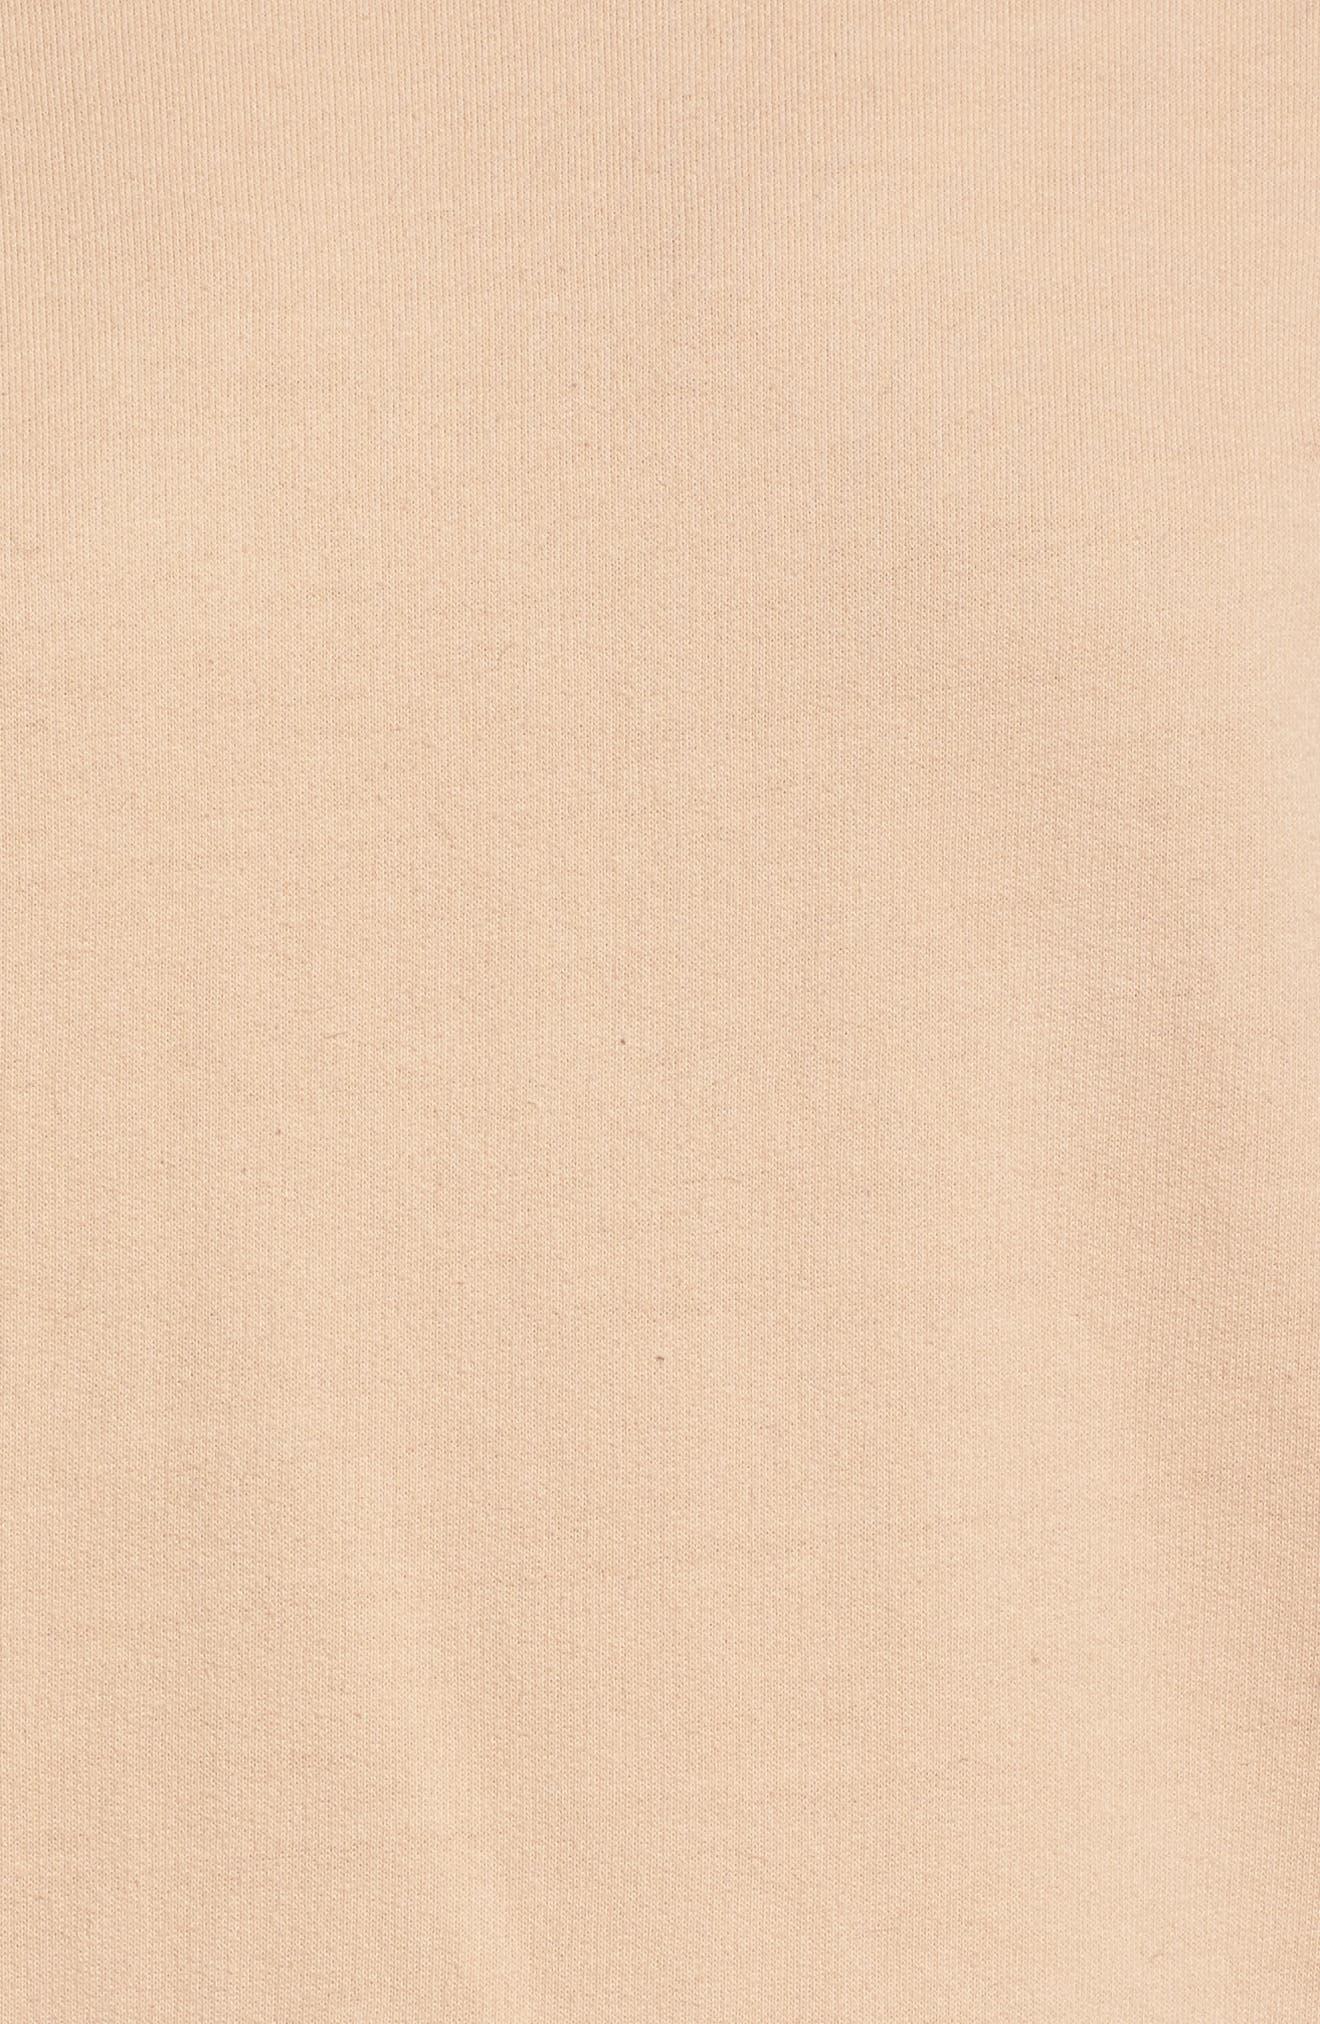 Sweatshirt Dress,                             Alternate thumbnail 5, color,                             950